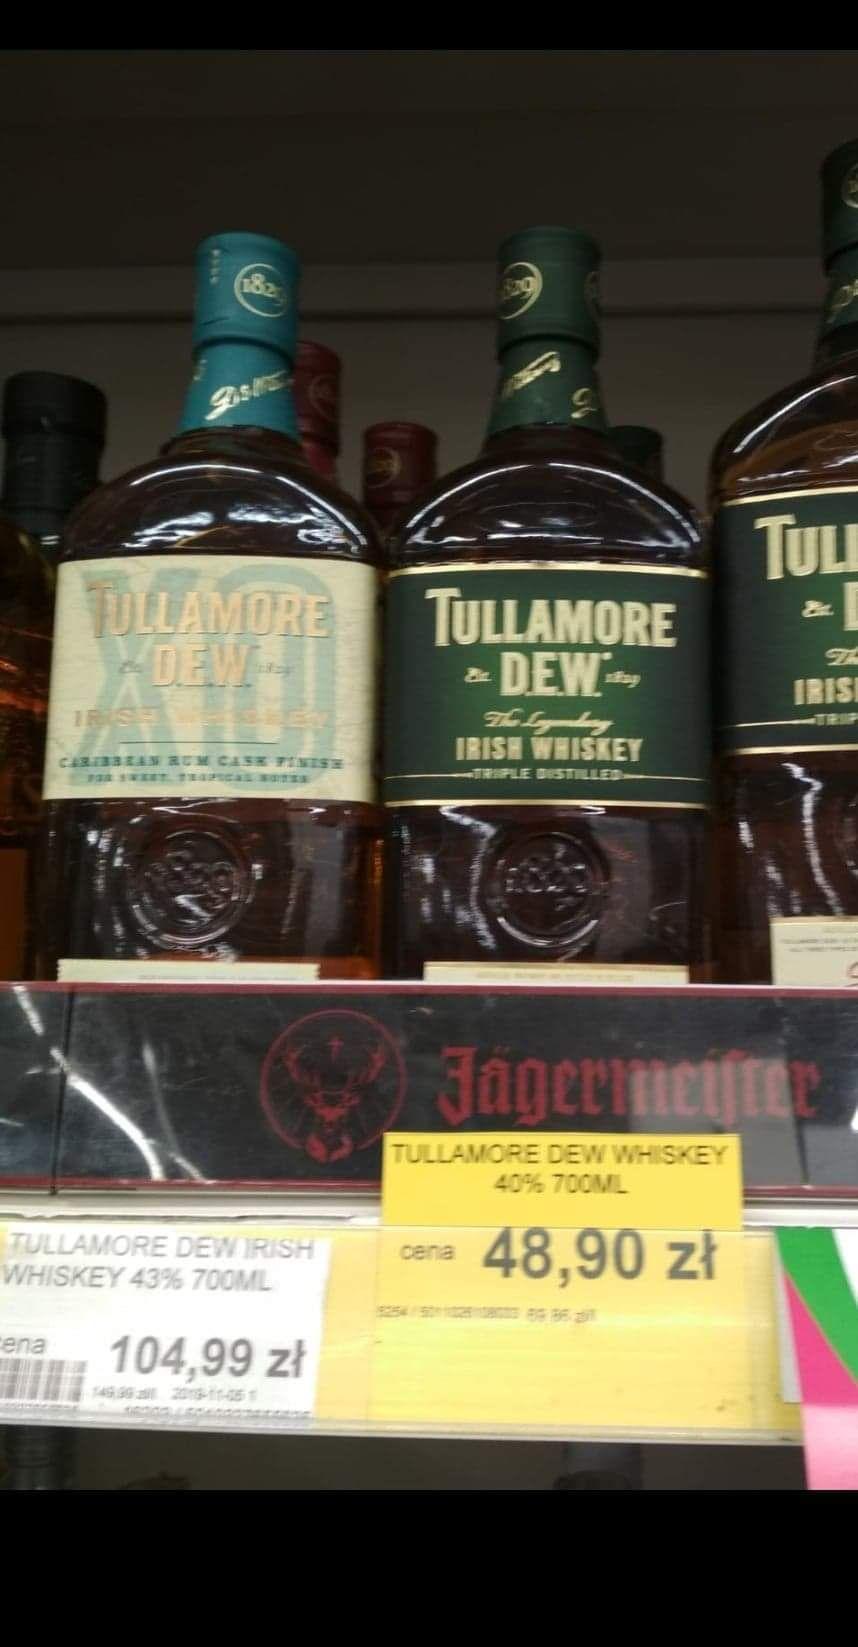 TULLAMORE DEW 0,7 Toruń Lewiatan tylko dziś i jutro Whisky whiskey